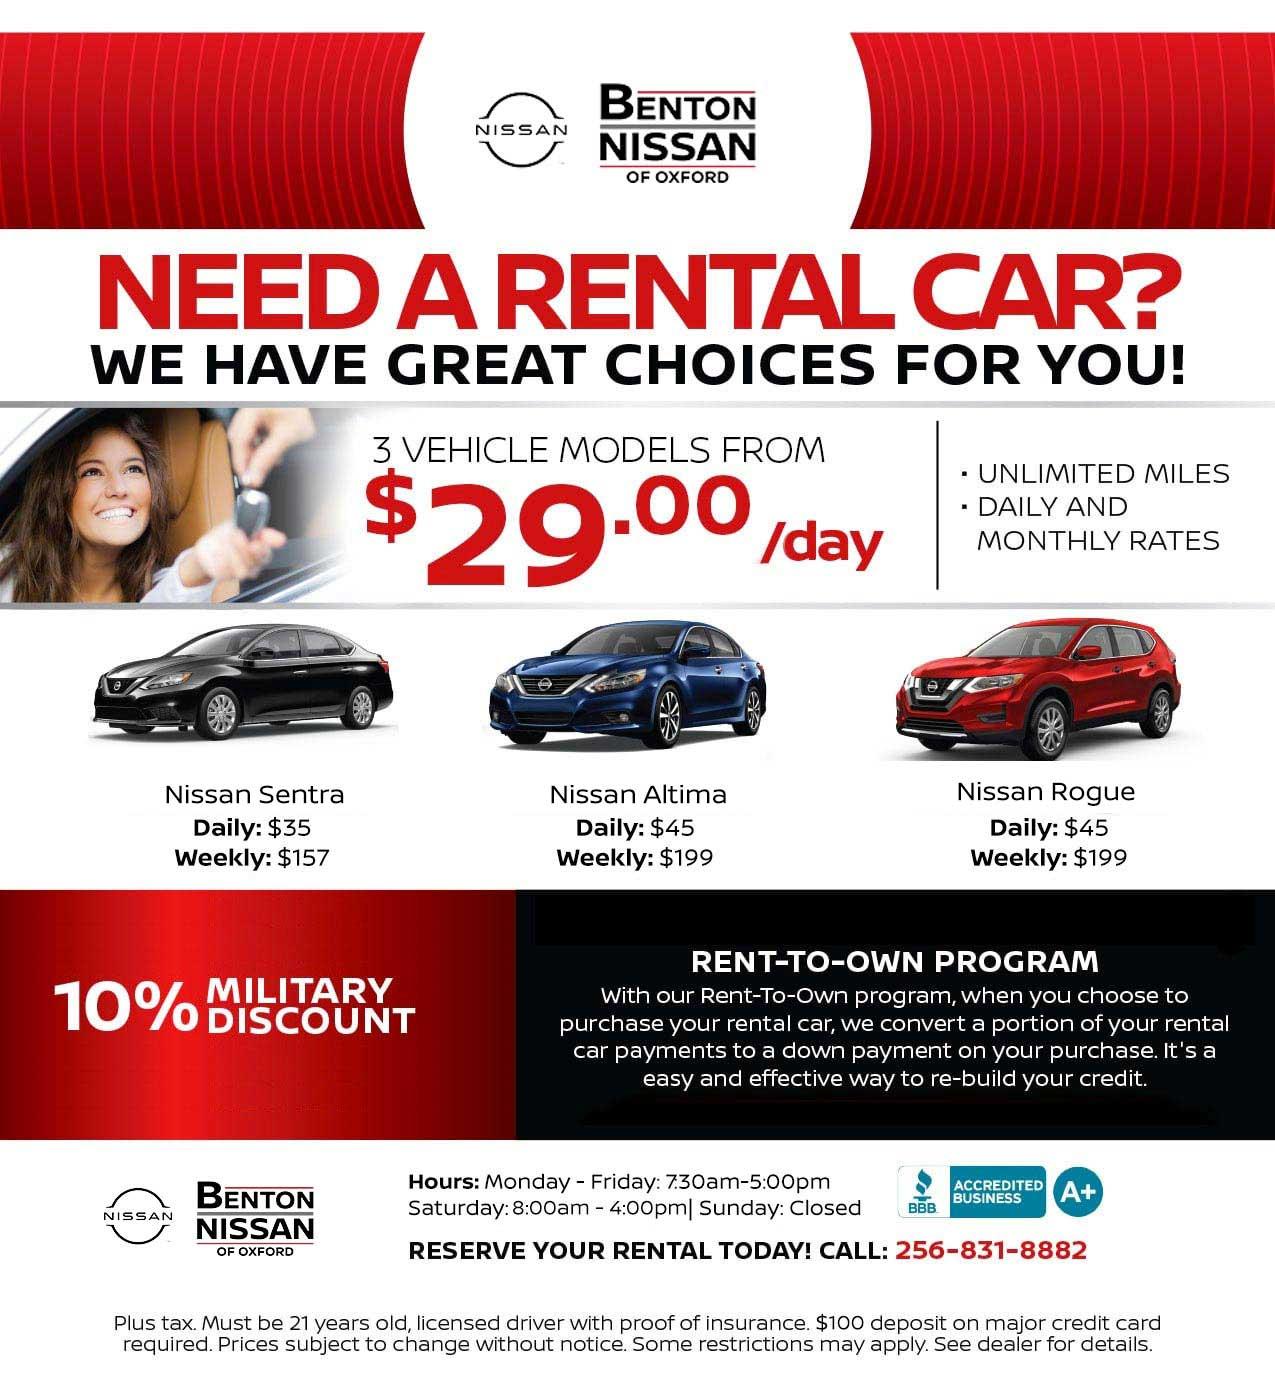 Rental Car Service Benton Nissan In Oxford Near Talladega Al